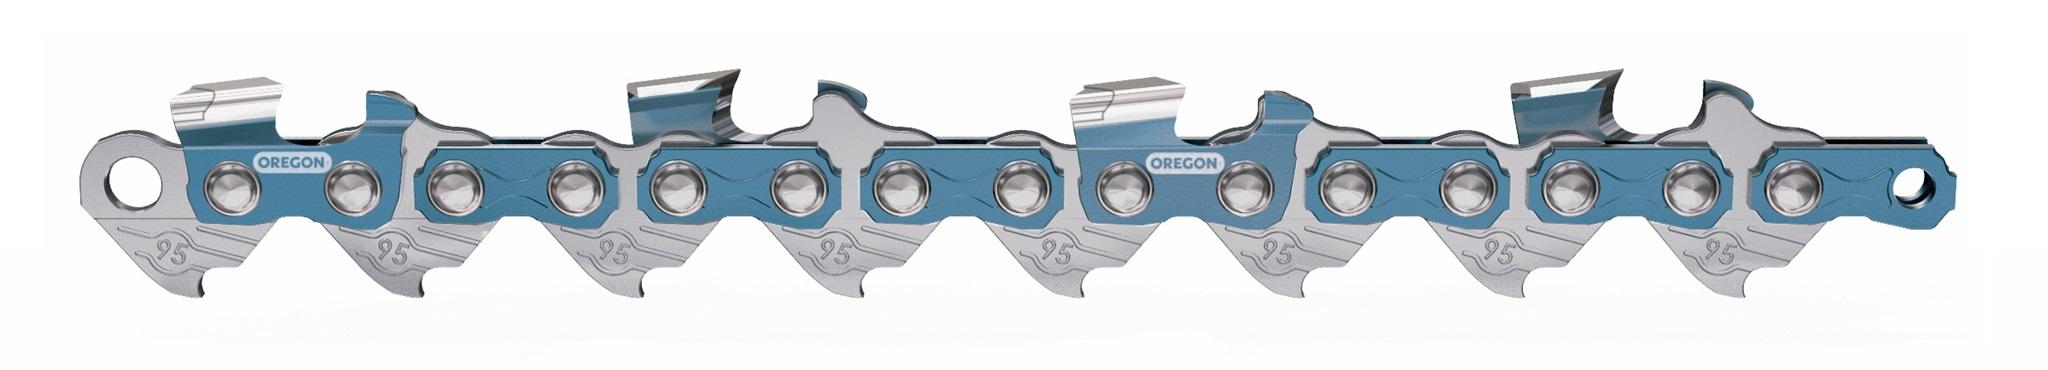 Lant Oregon 95TXL - SpeedCut